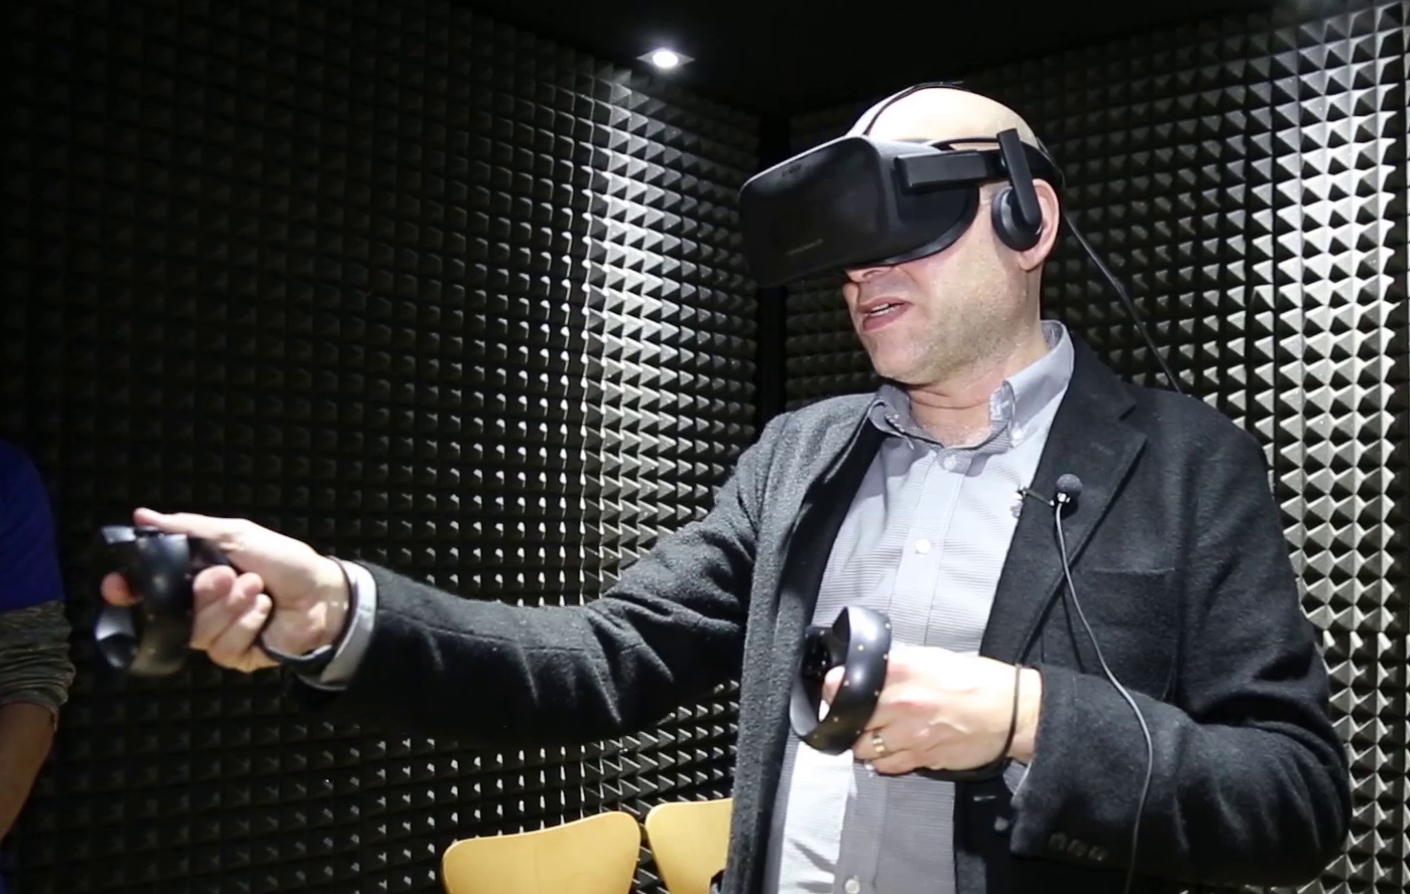 oculus rift at ces 2016